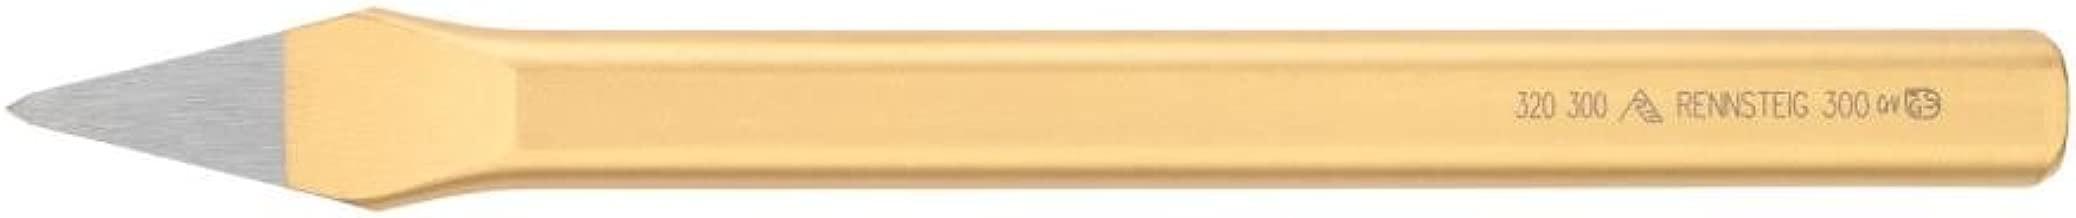 Crosscut Chisell grip 250 mm